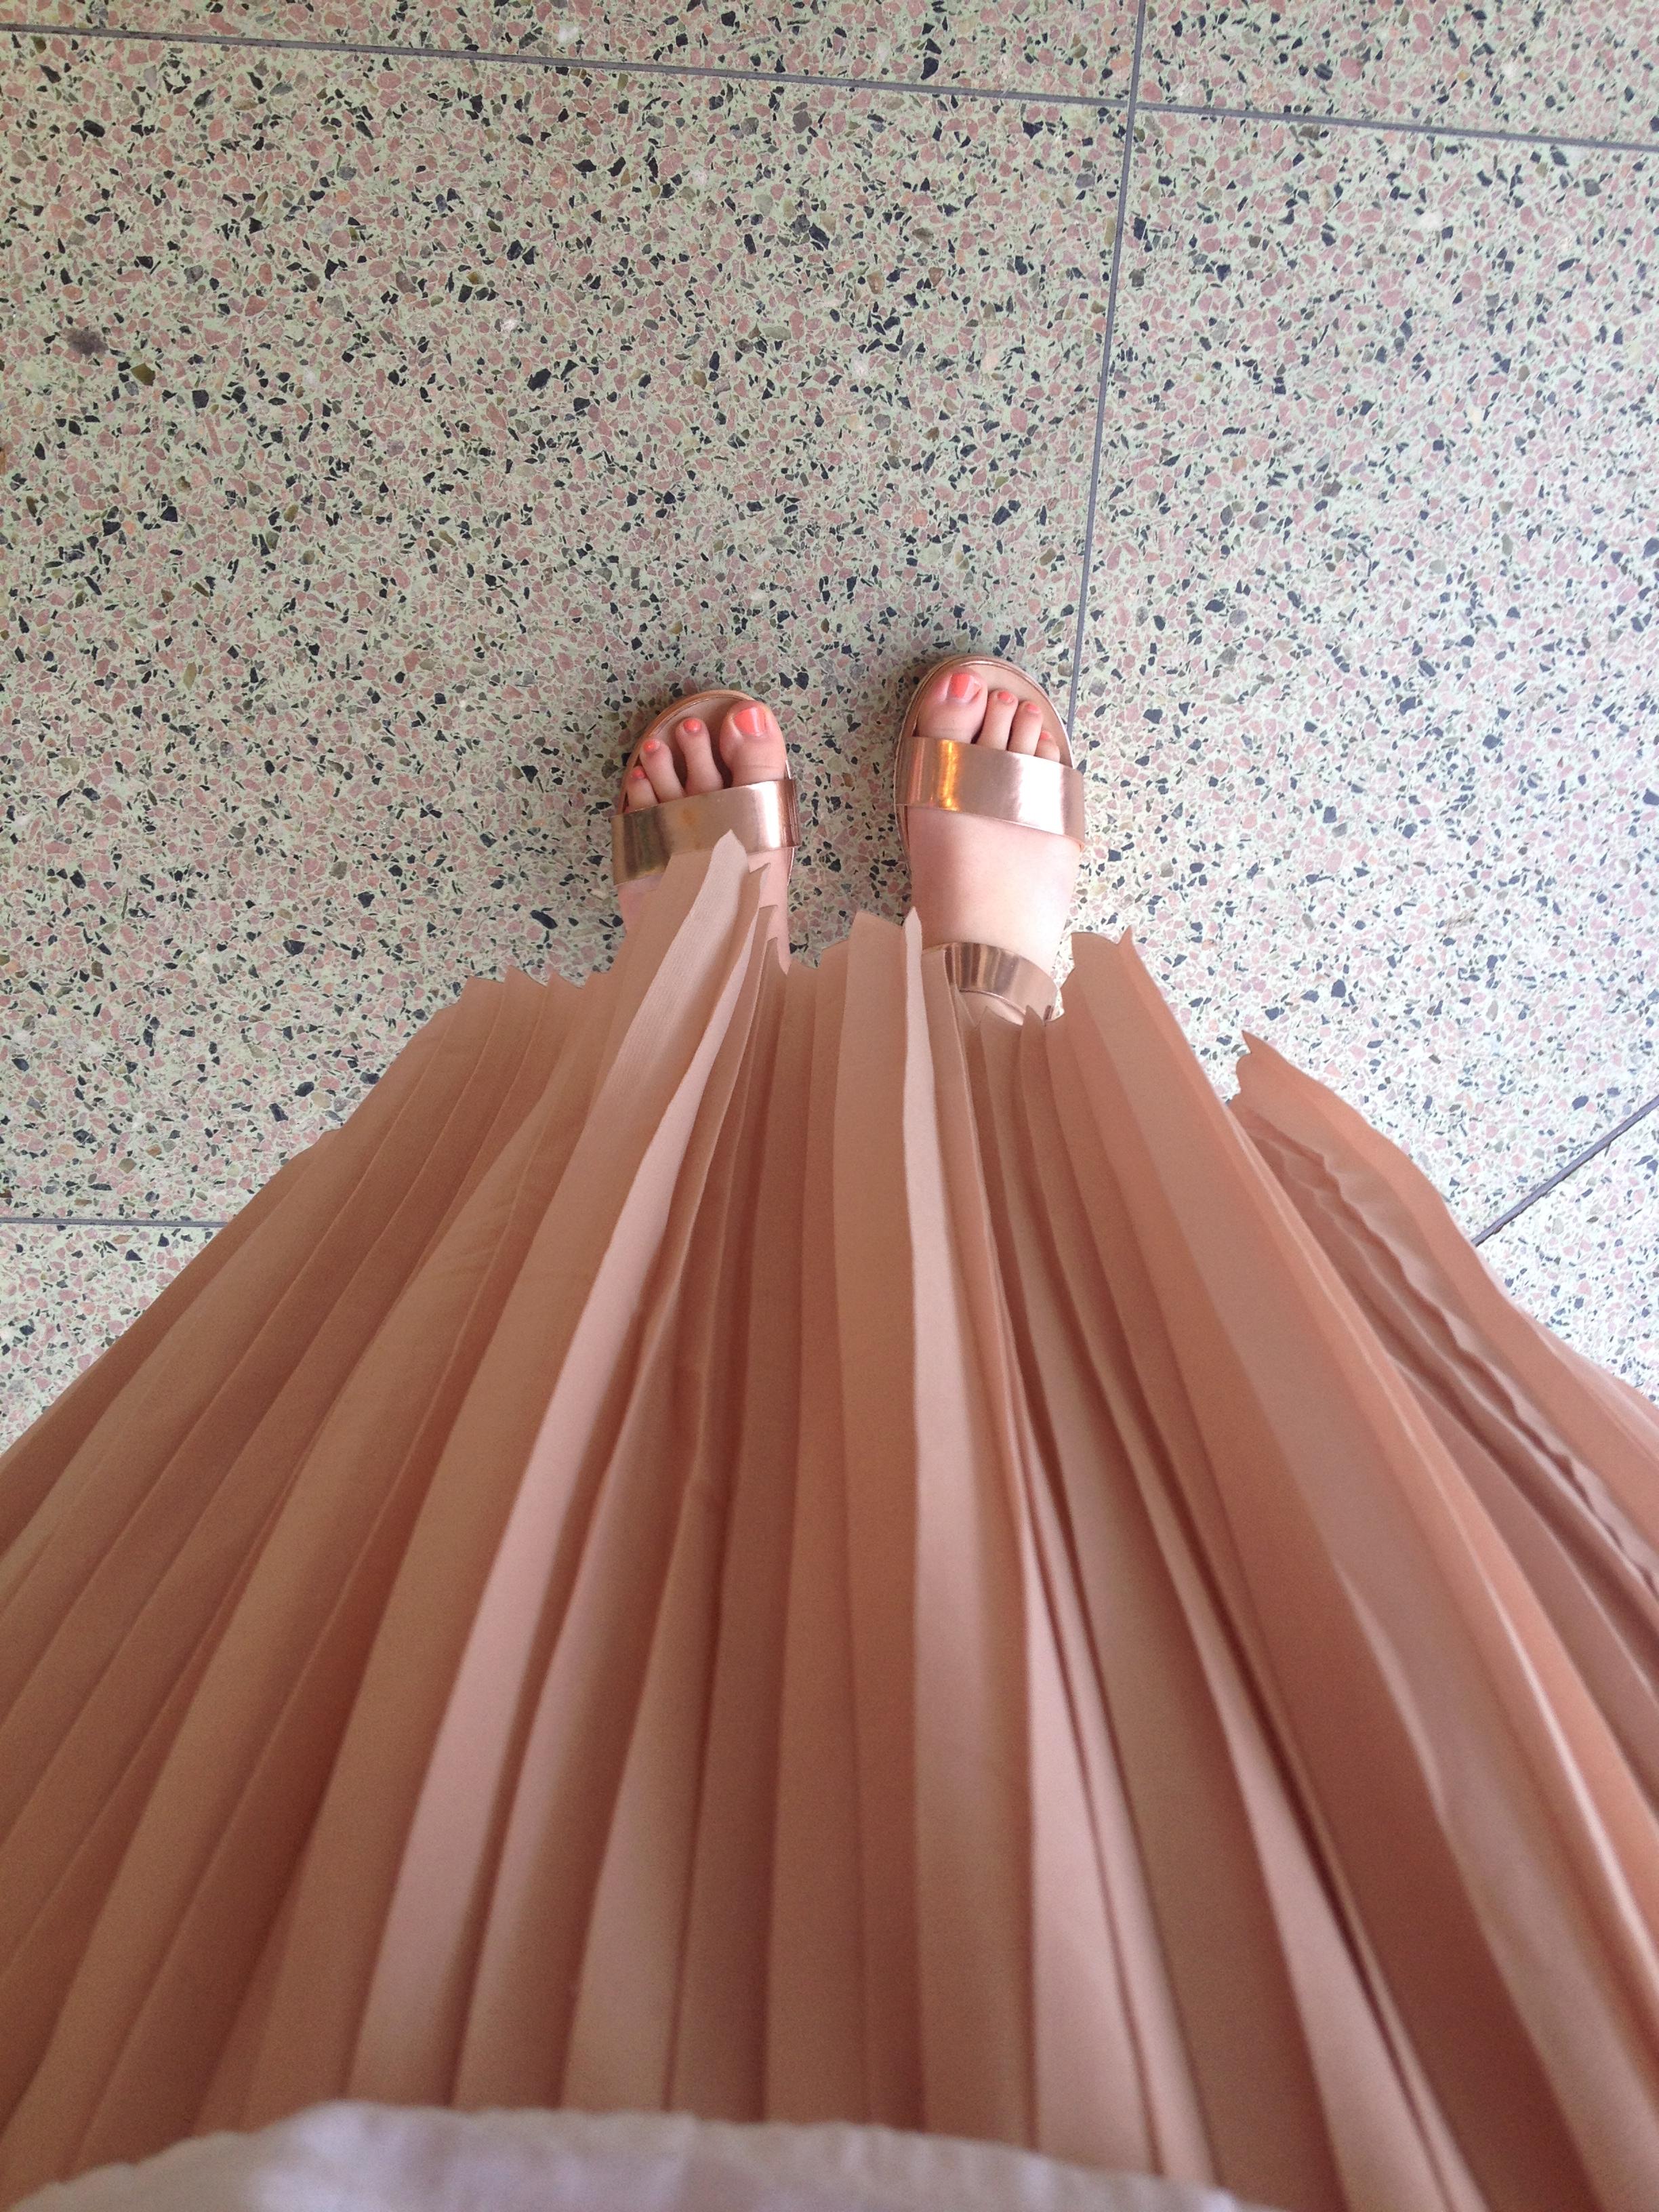 lifelately_skirtsandals